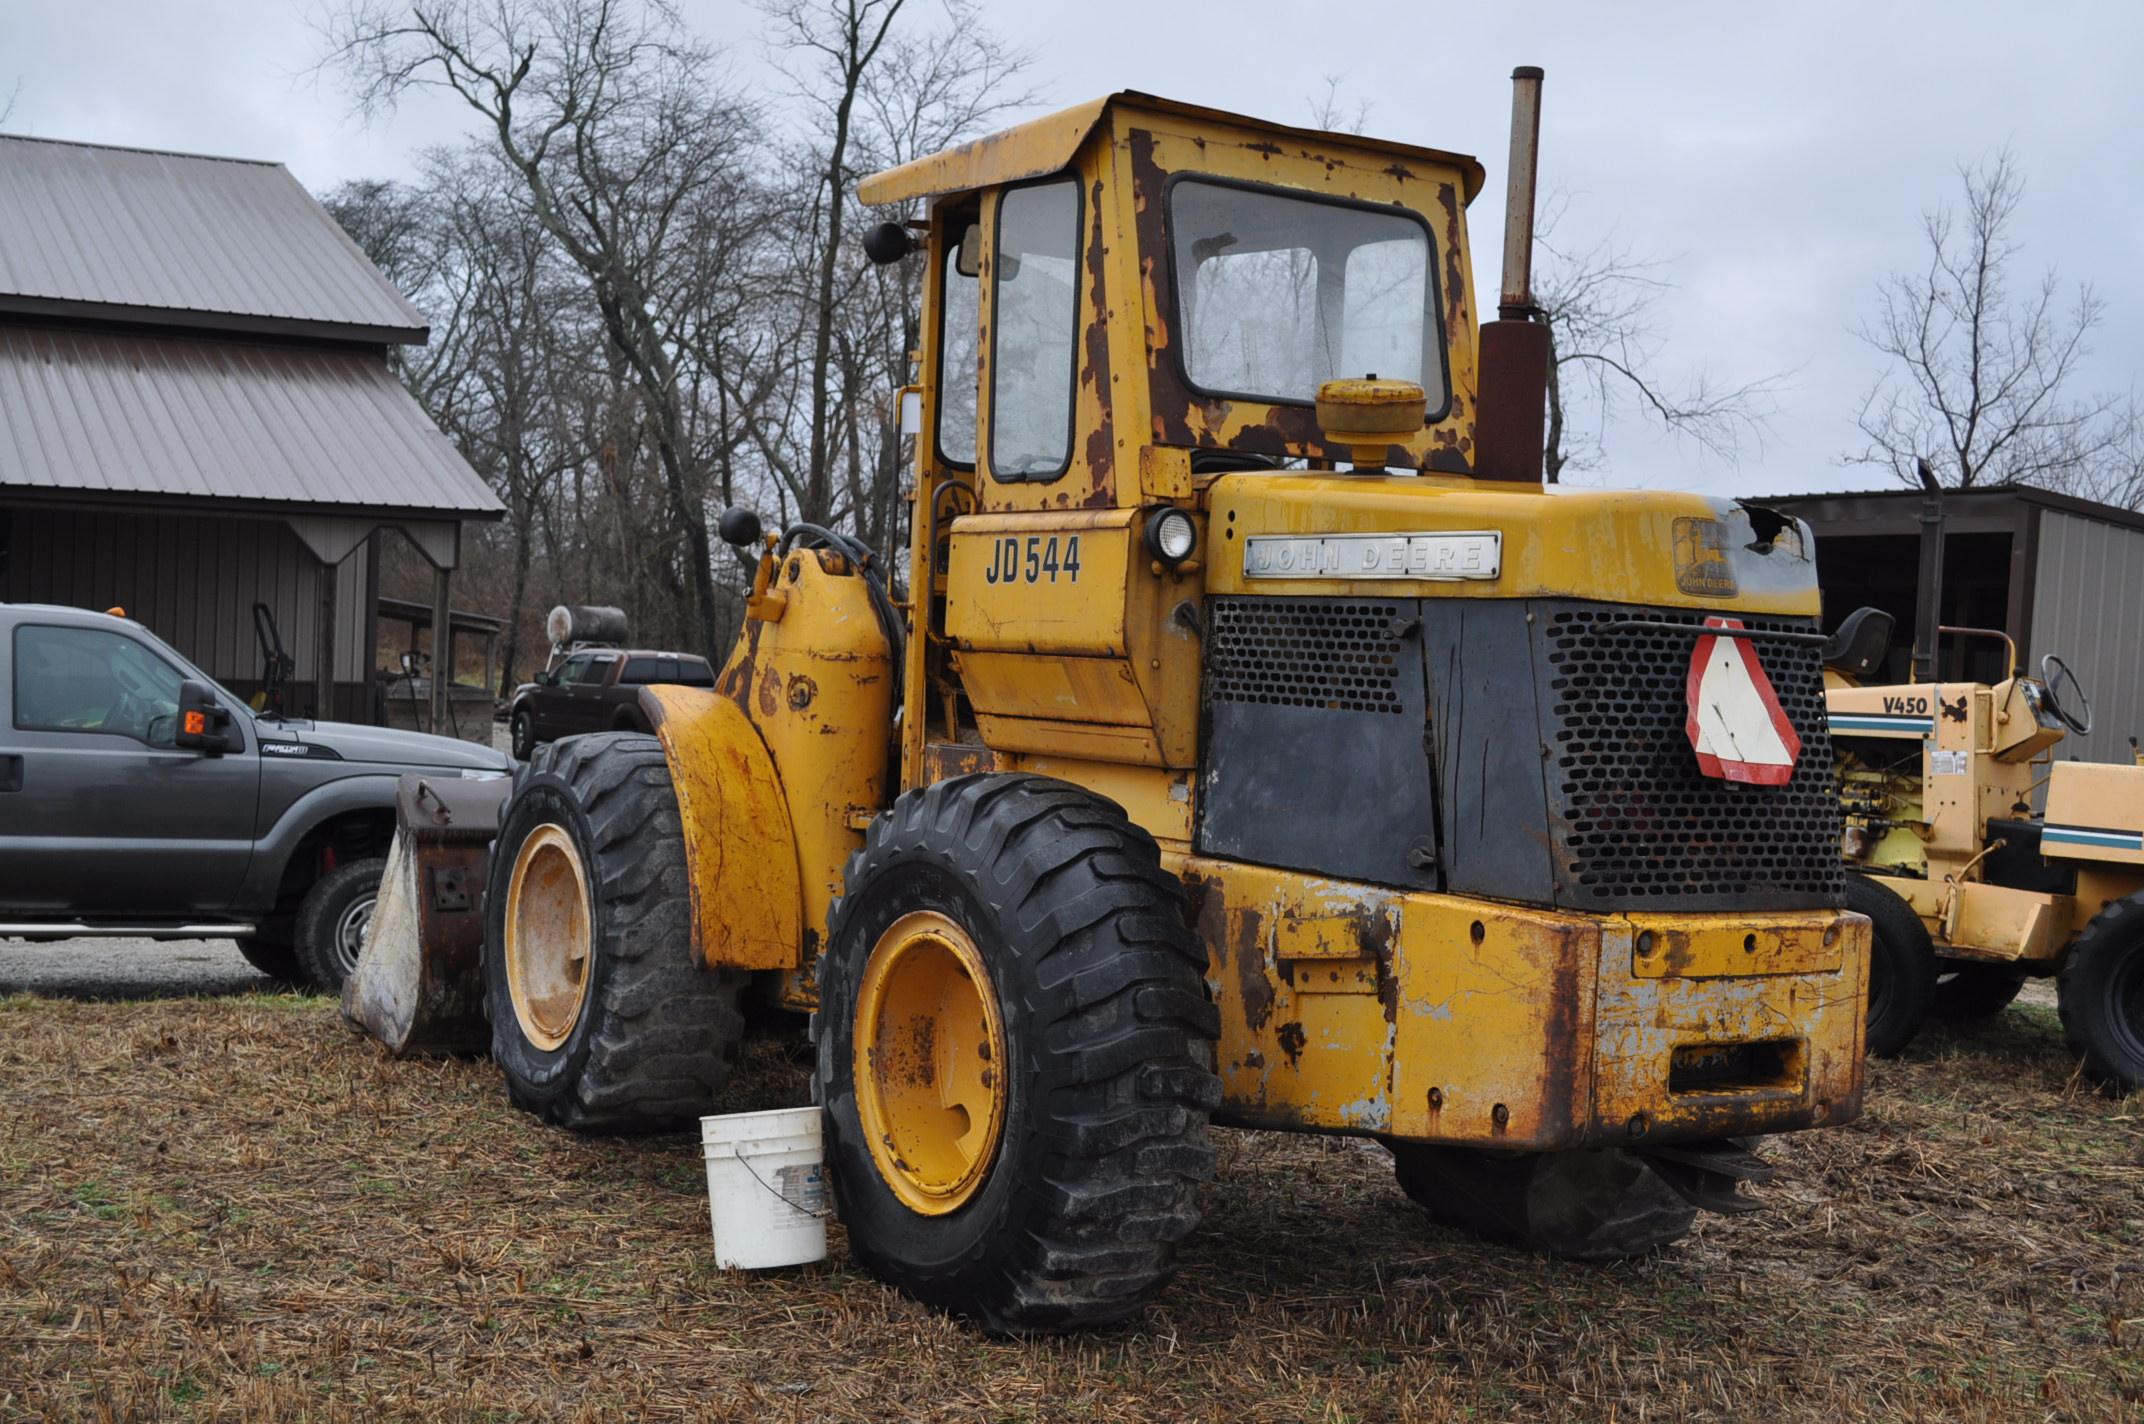 John Deere 544 Payloader, 17.5-25 tires, shows 1074 hrs, SN 0767621 - Image 2 of 16